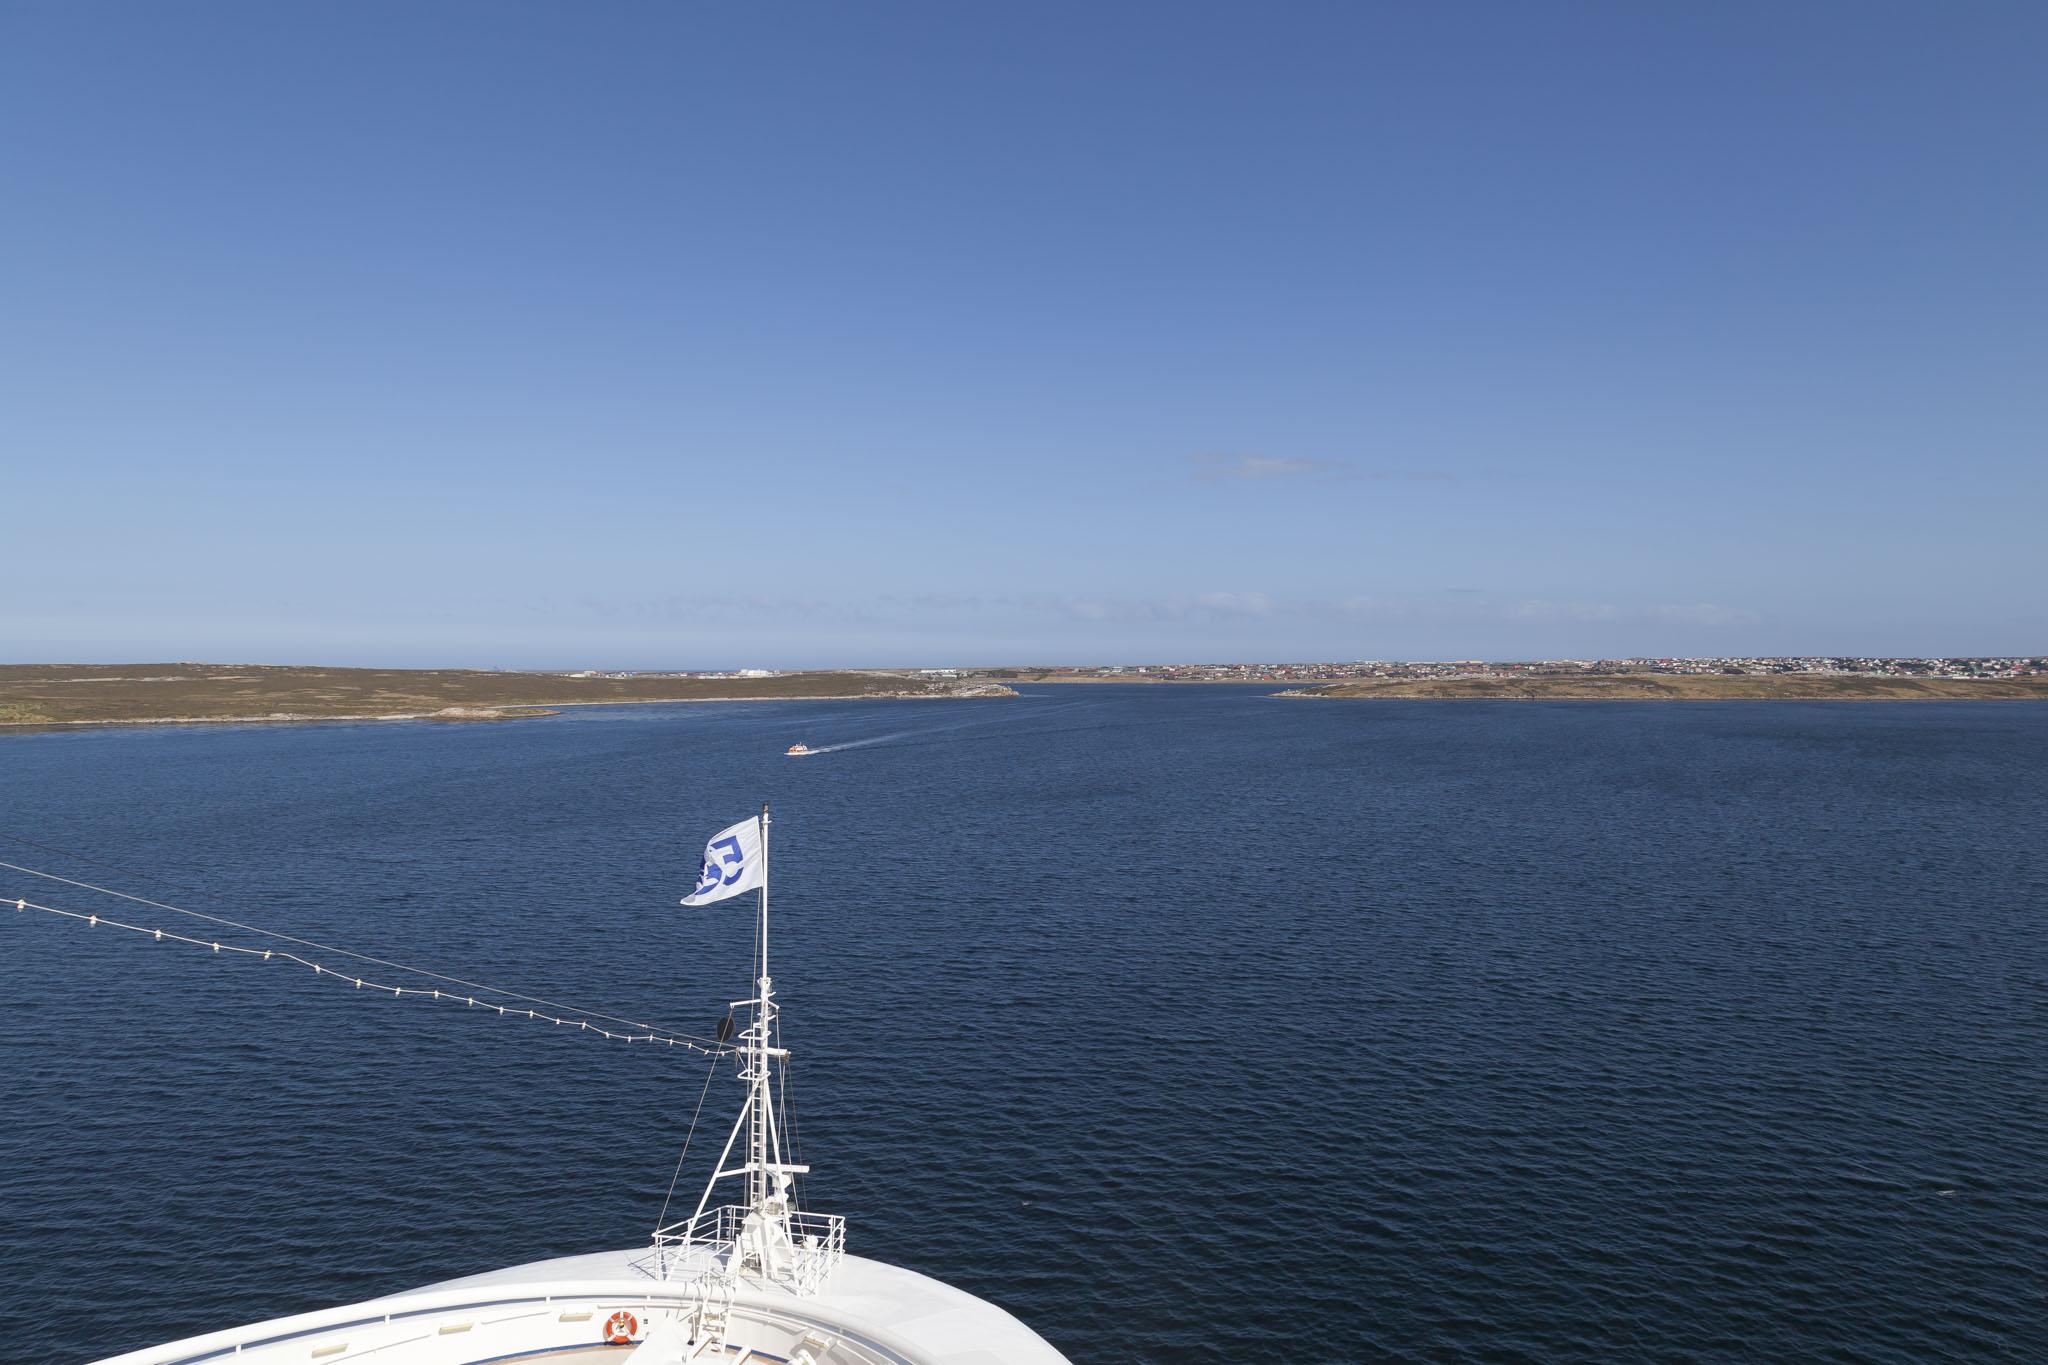 Falkland Islands, Star Princess